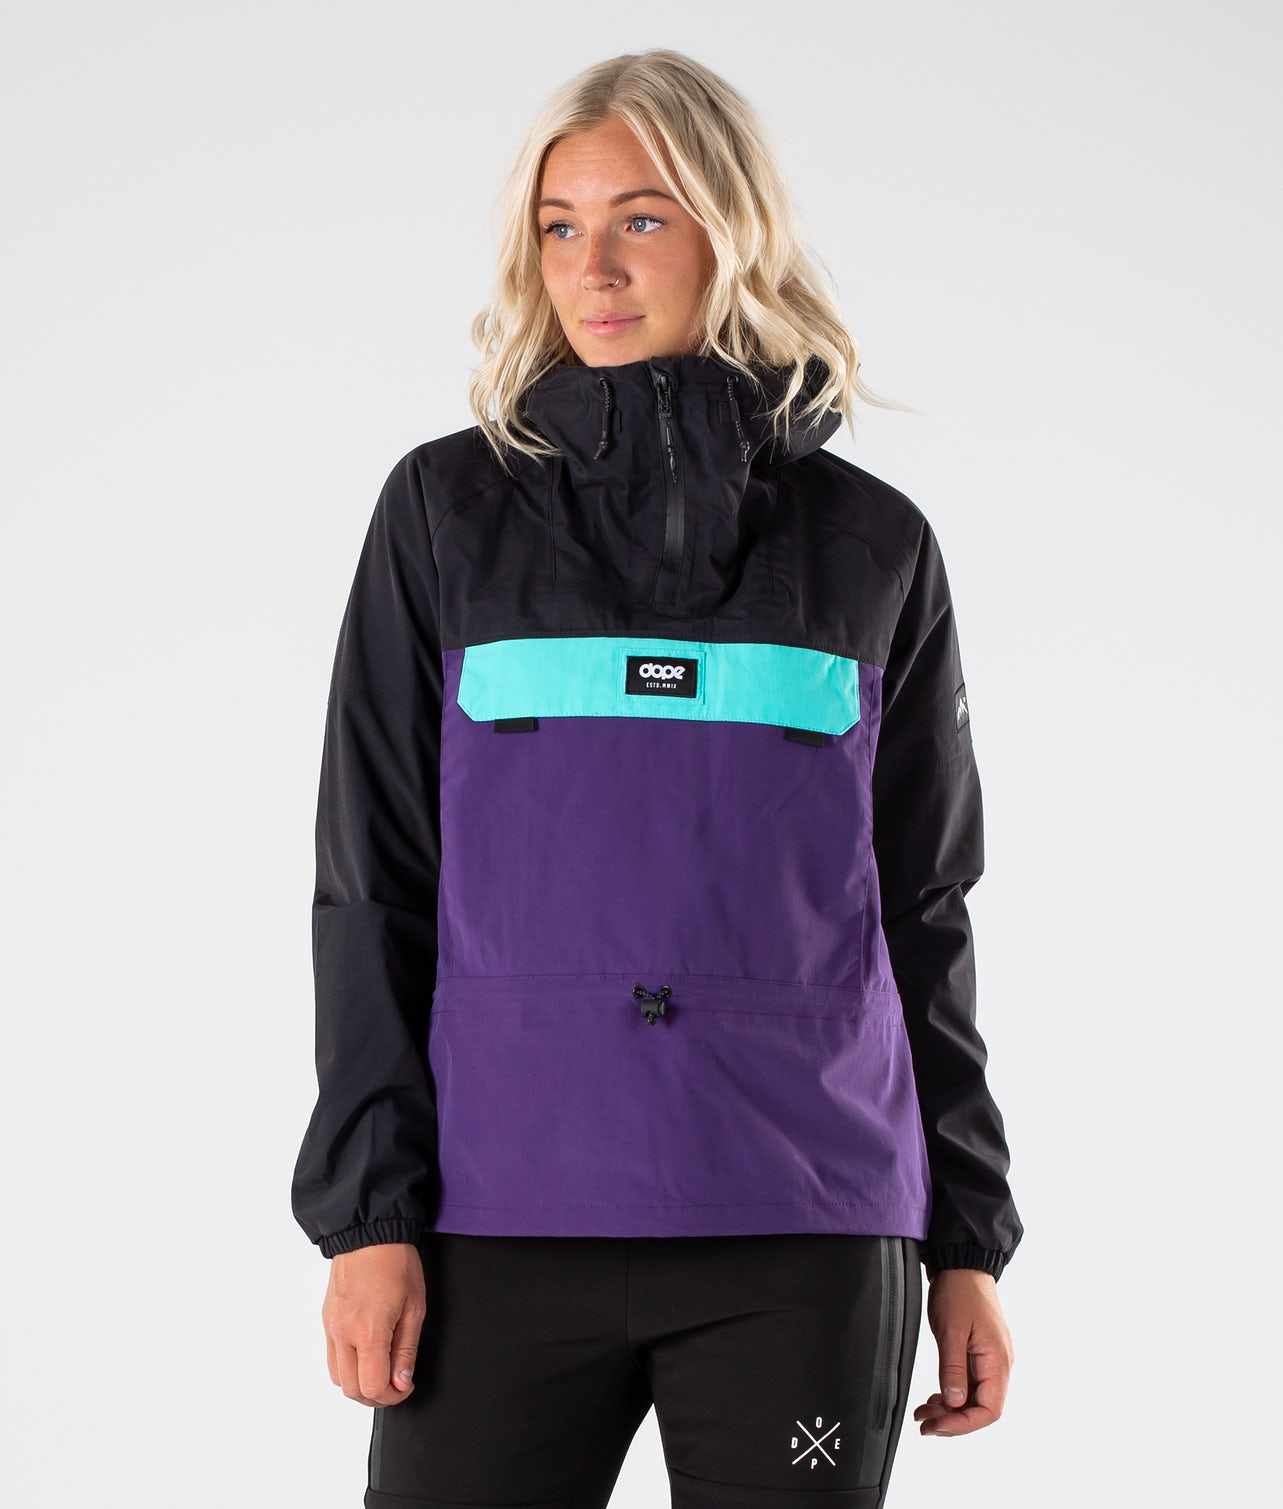 Dope Hiker 19 W Outdoor Jacka Black/Purple/Azure